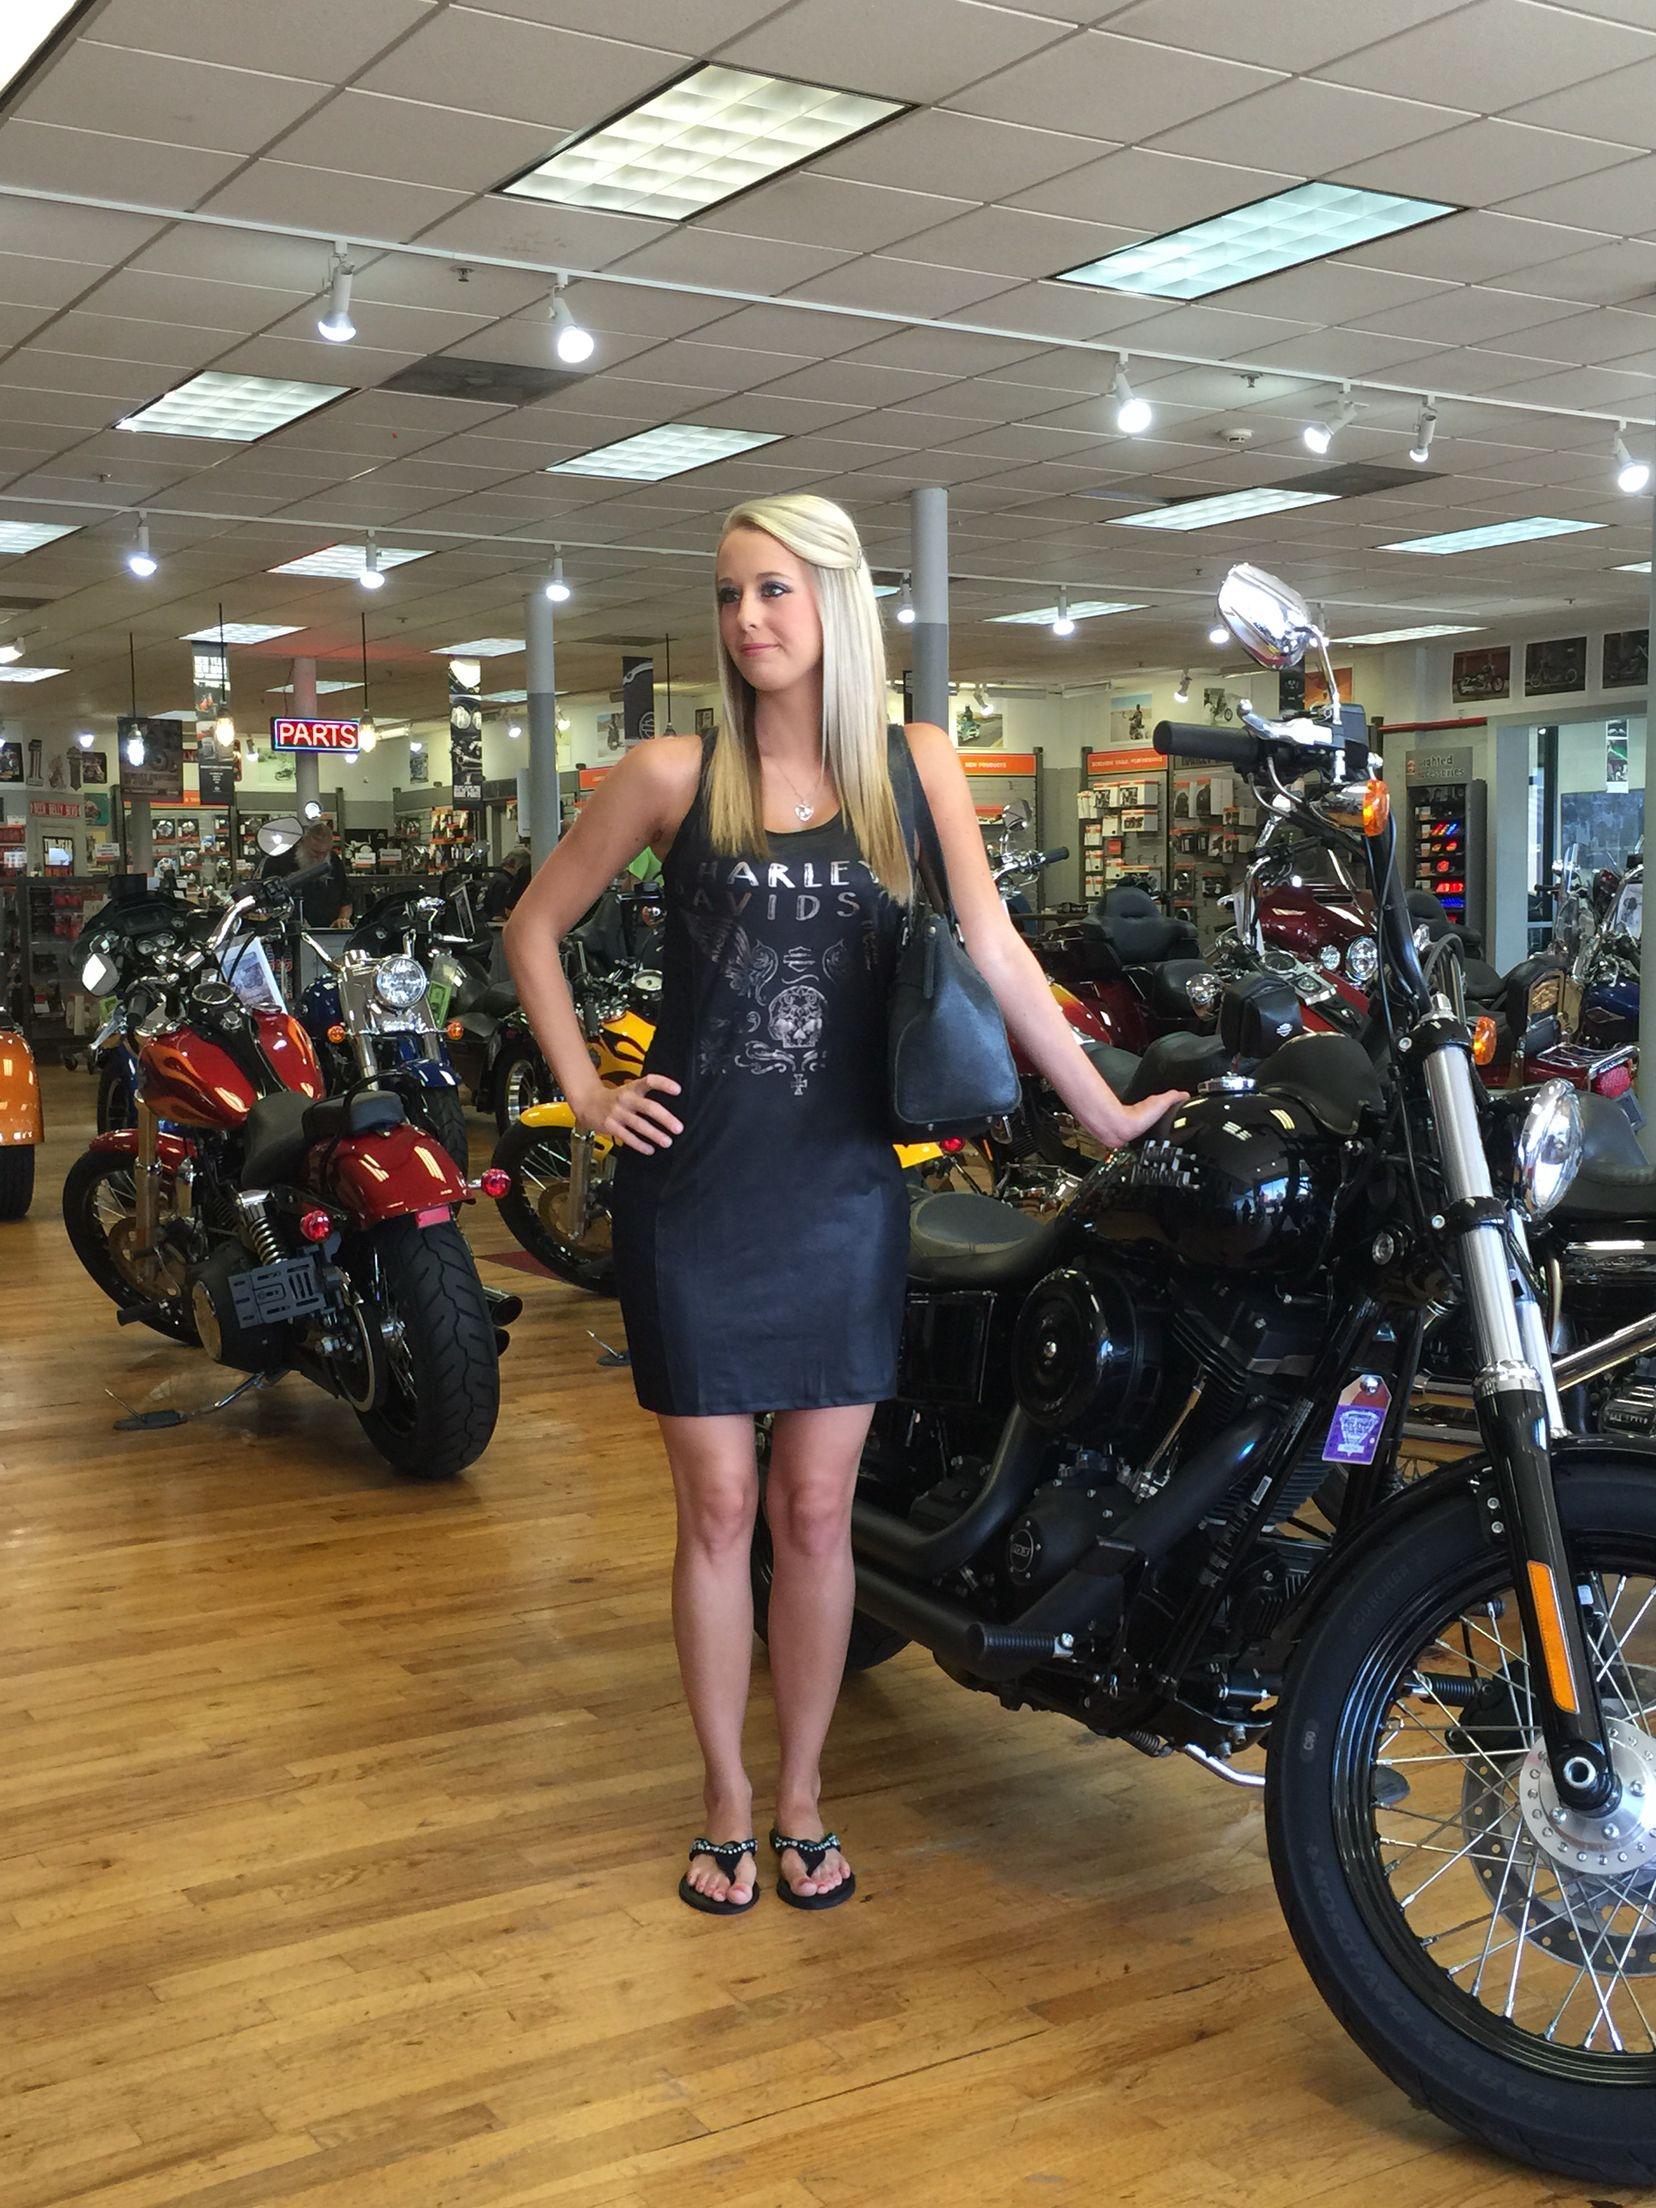 Harley Davidson Dress Wvharley 304 768 1600 Fashion Women Harley Davidson